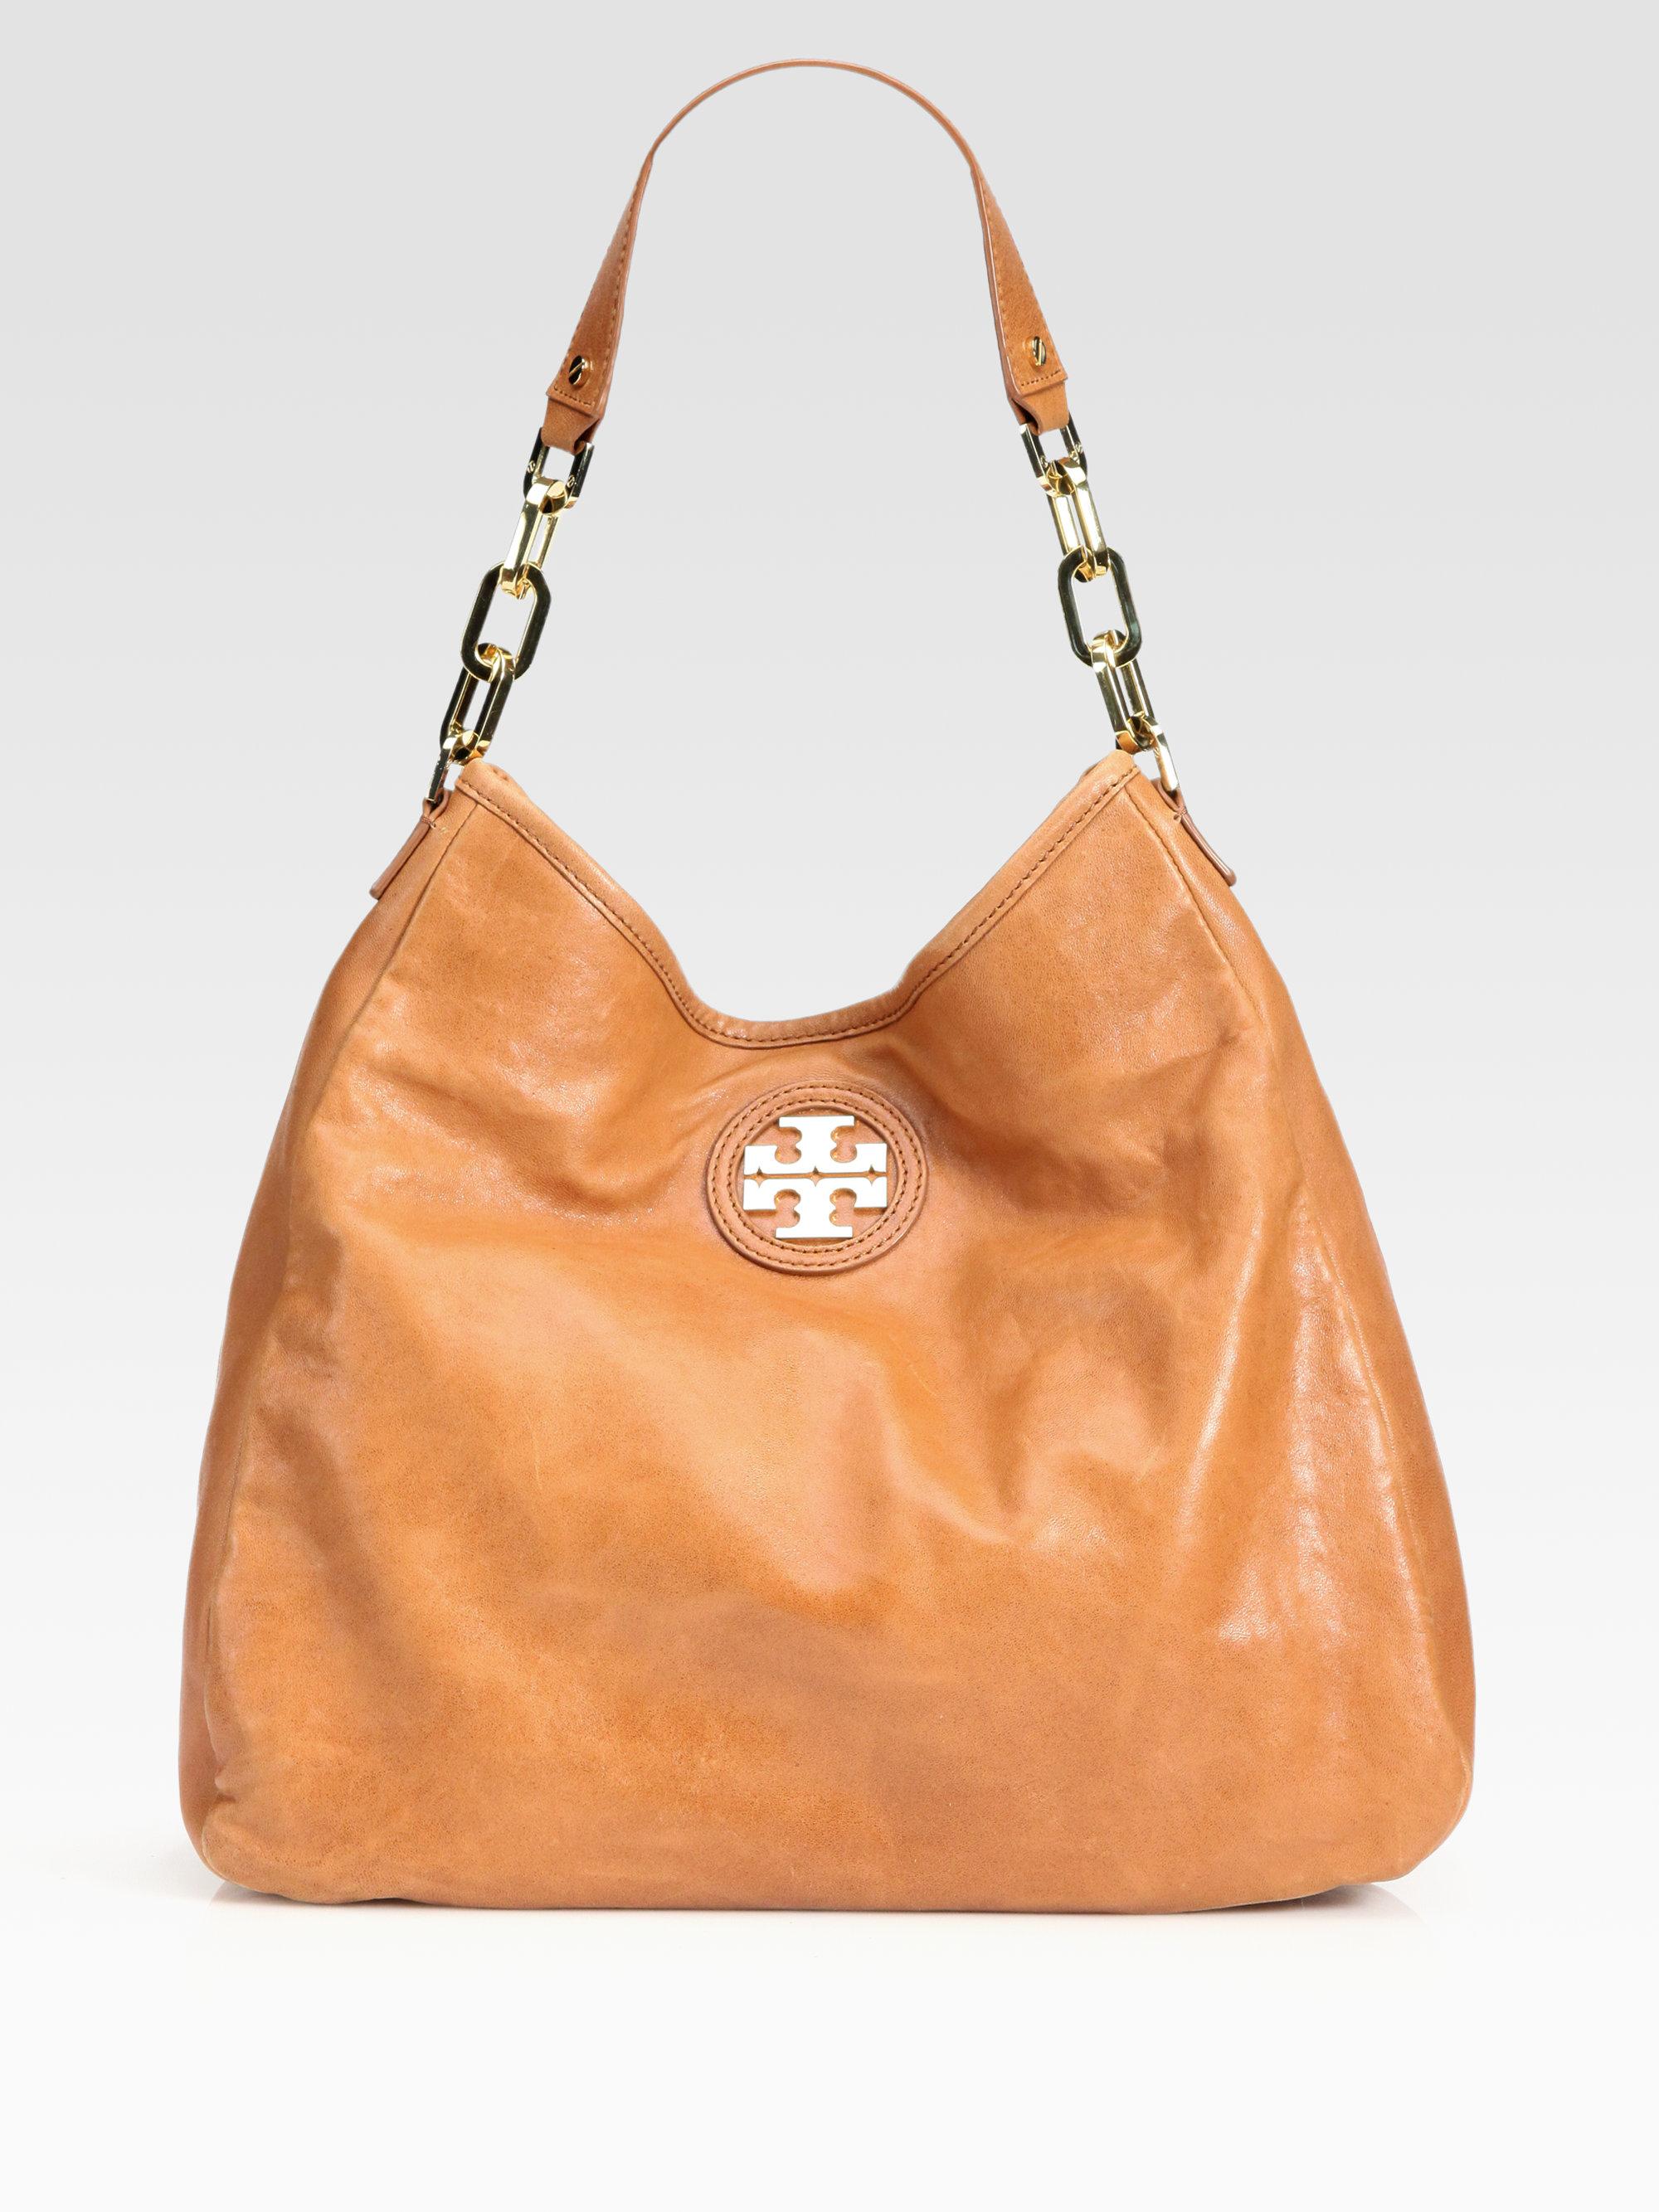 5fed184c86d Lyst - Tory Burch City Hobo Bag in Brown